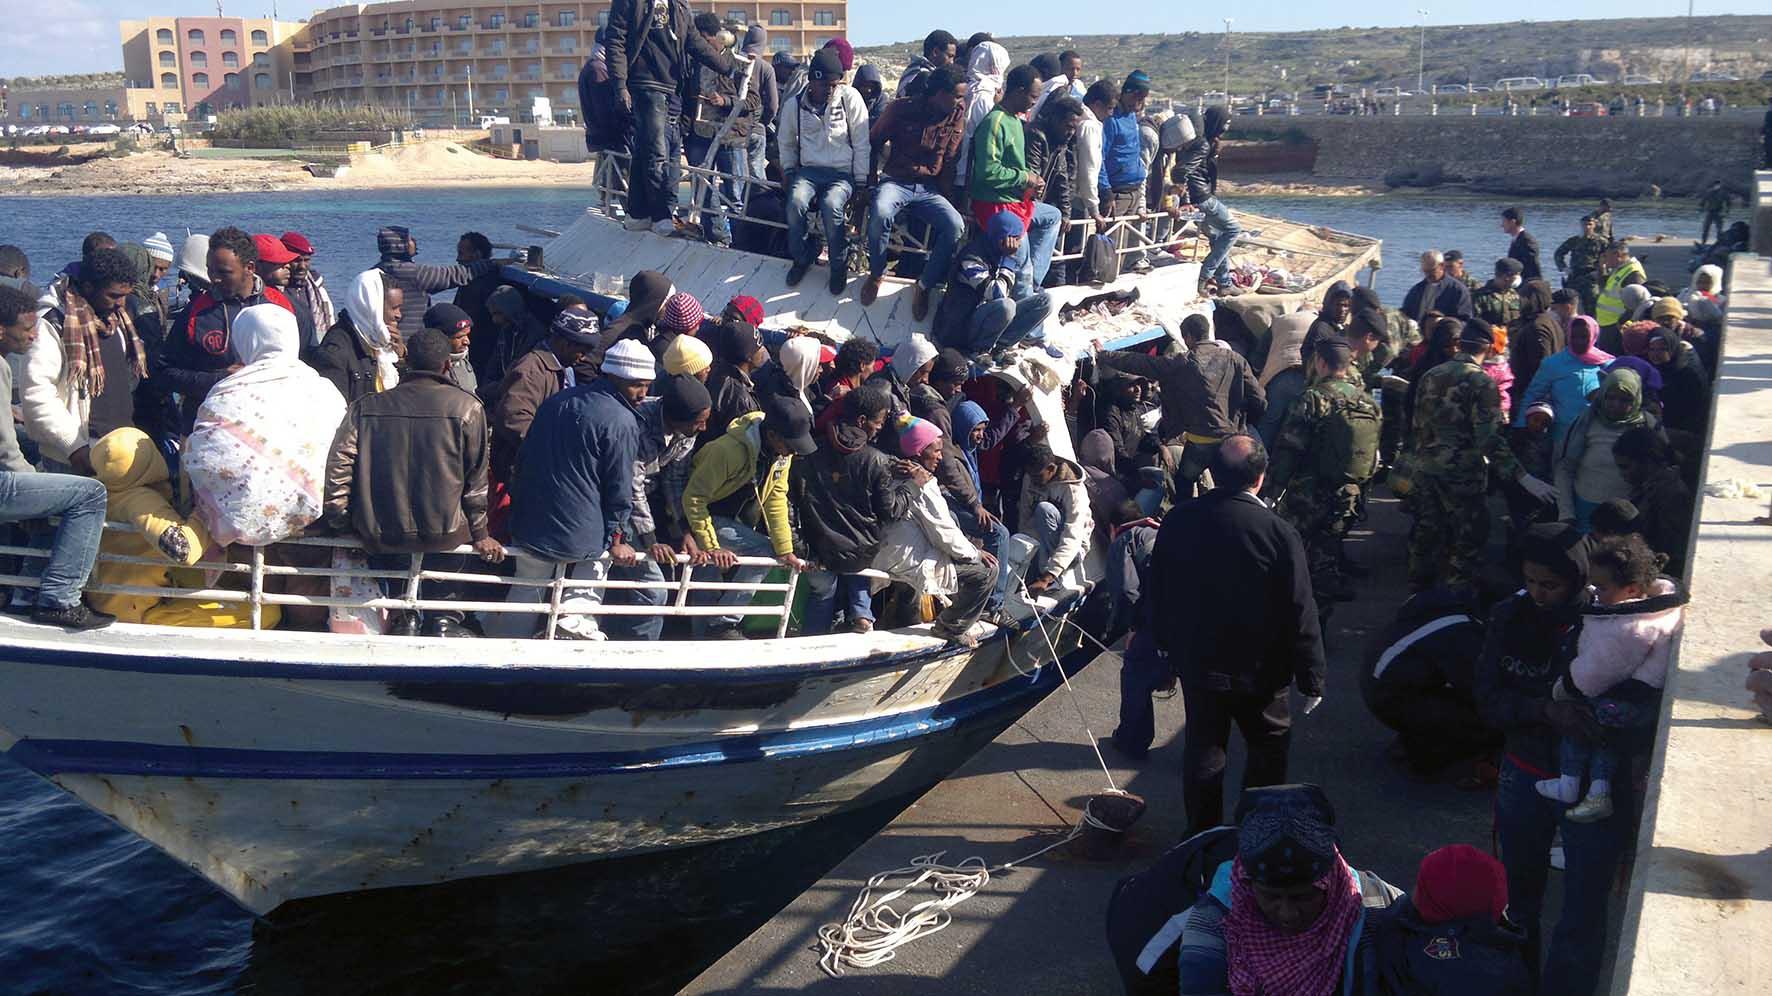 immigrazione operazione mare nostrum 3